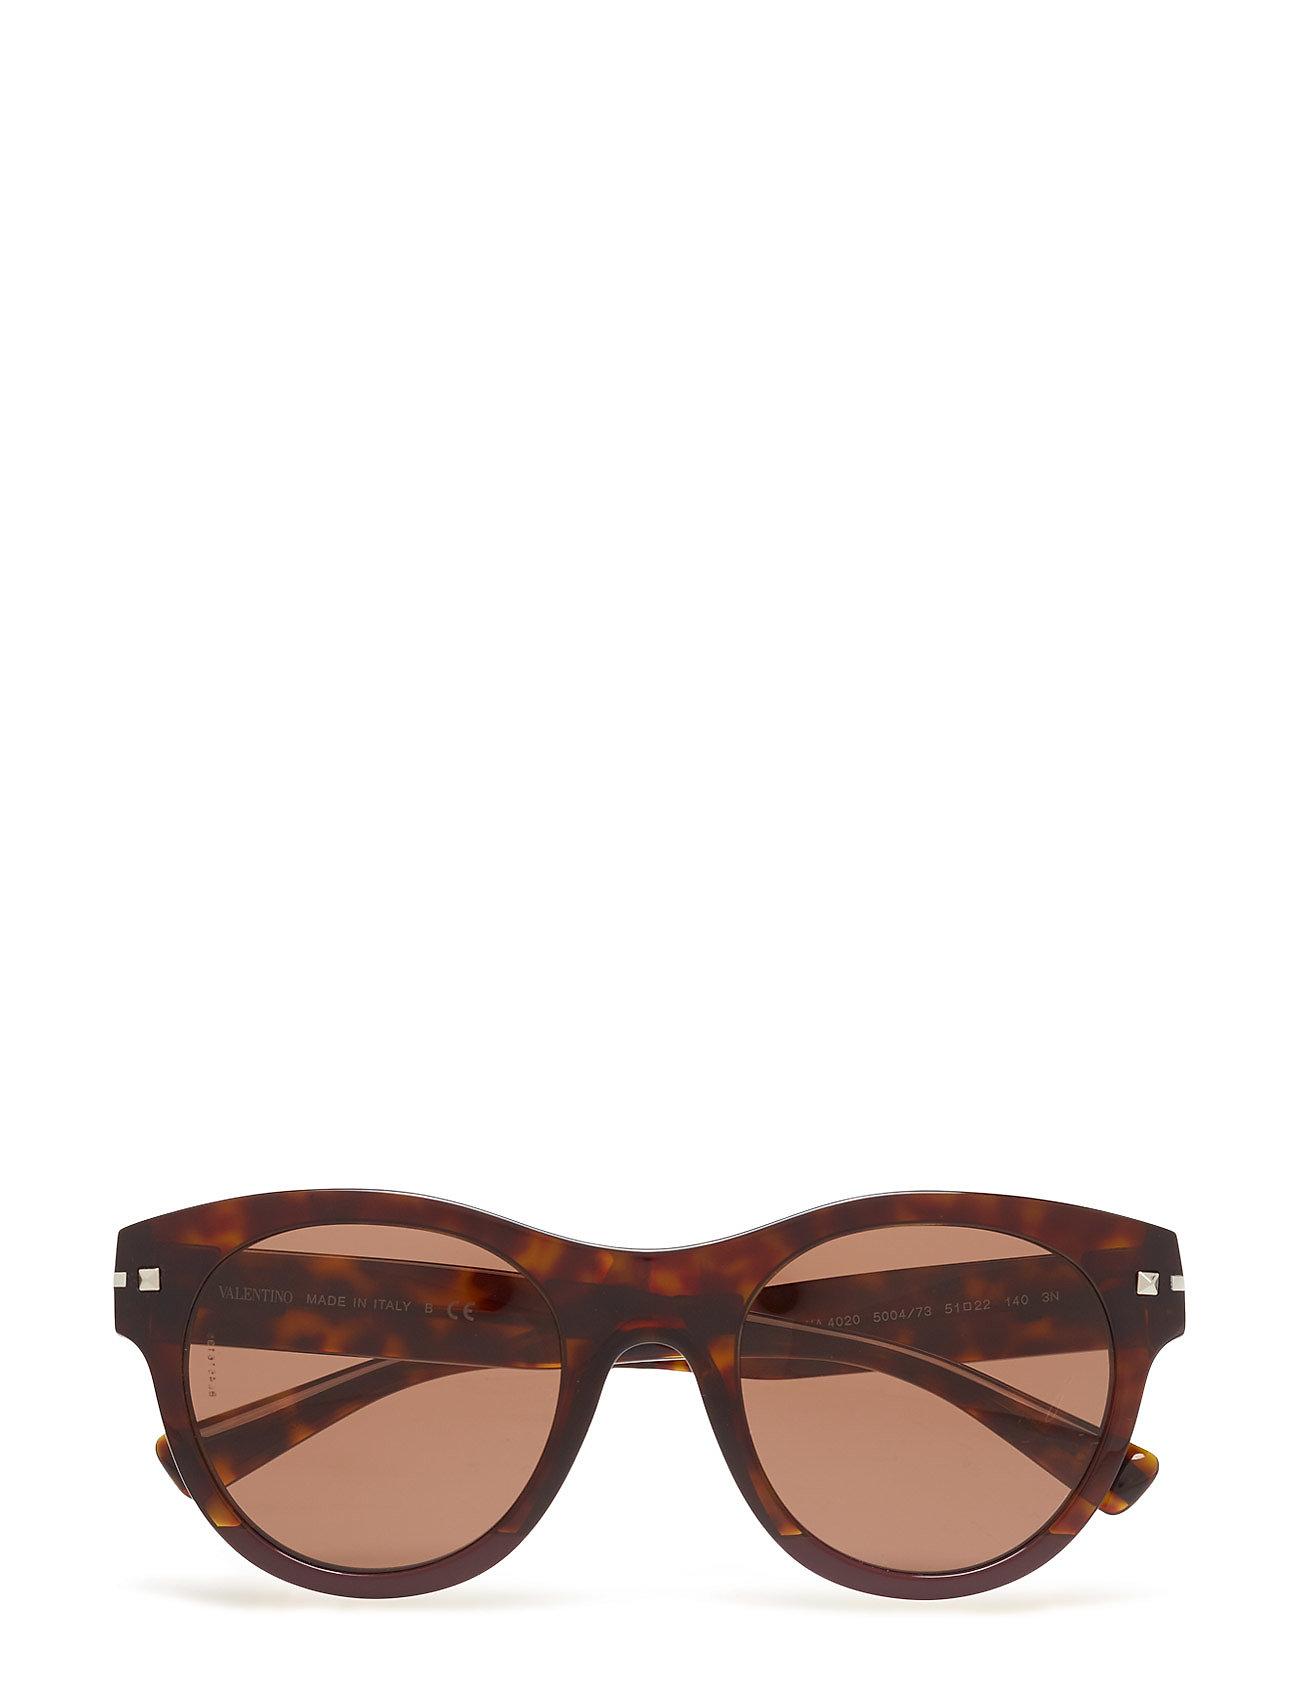 Legacy - Valentino Sunglasses